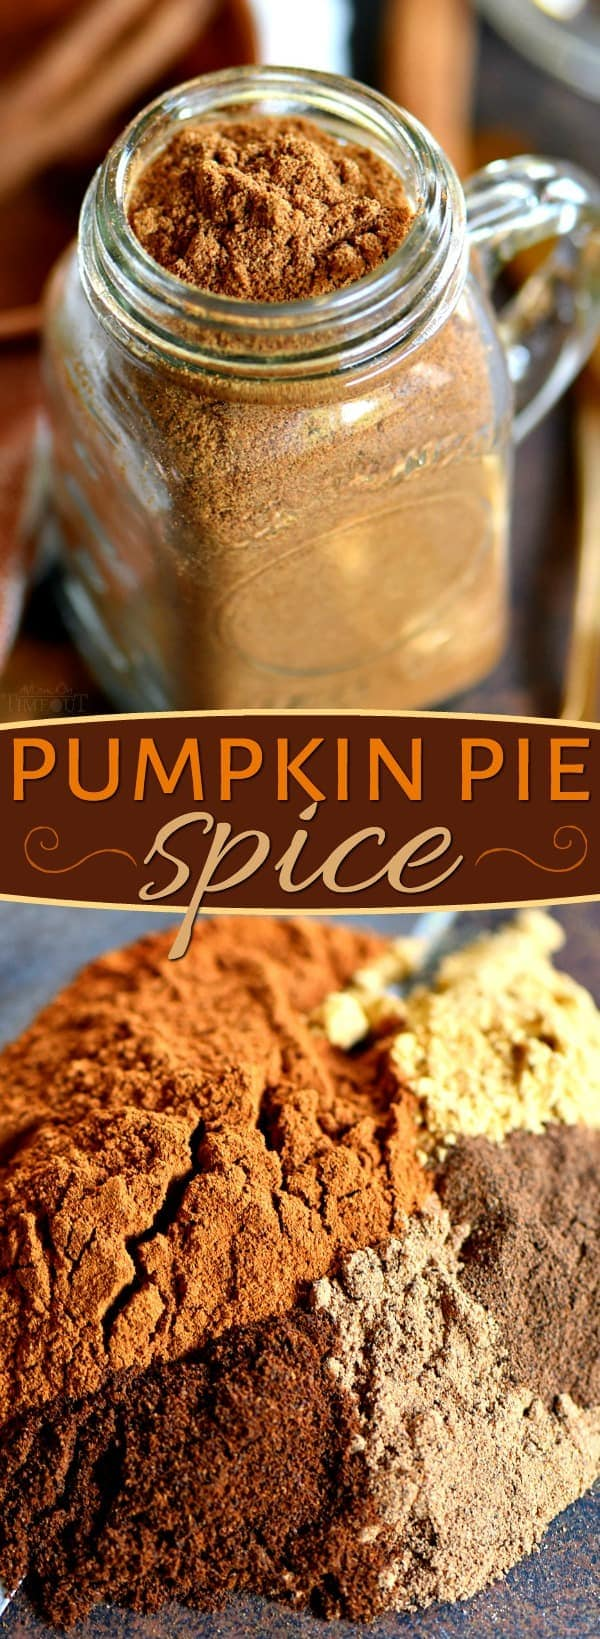 easy-pumpkin-pie-spice-recipe